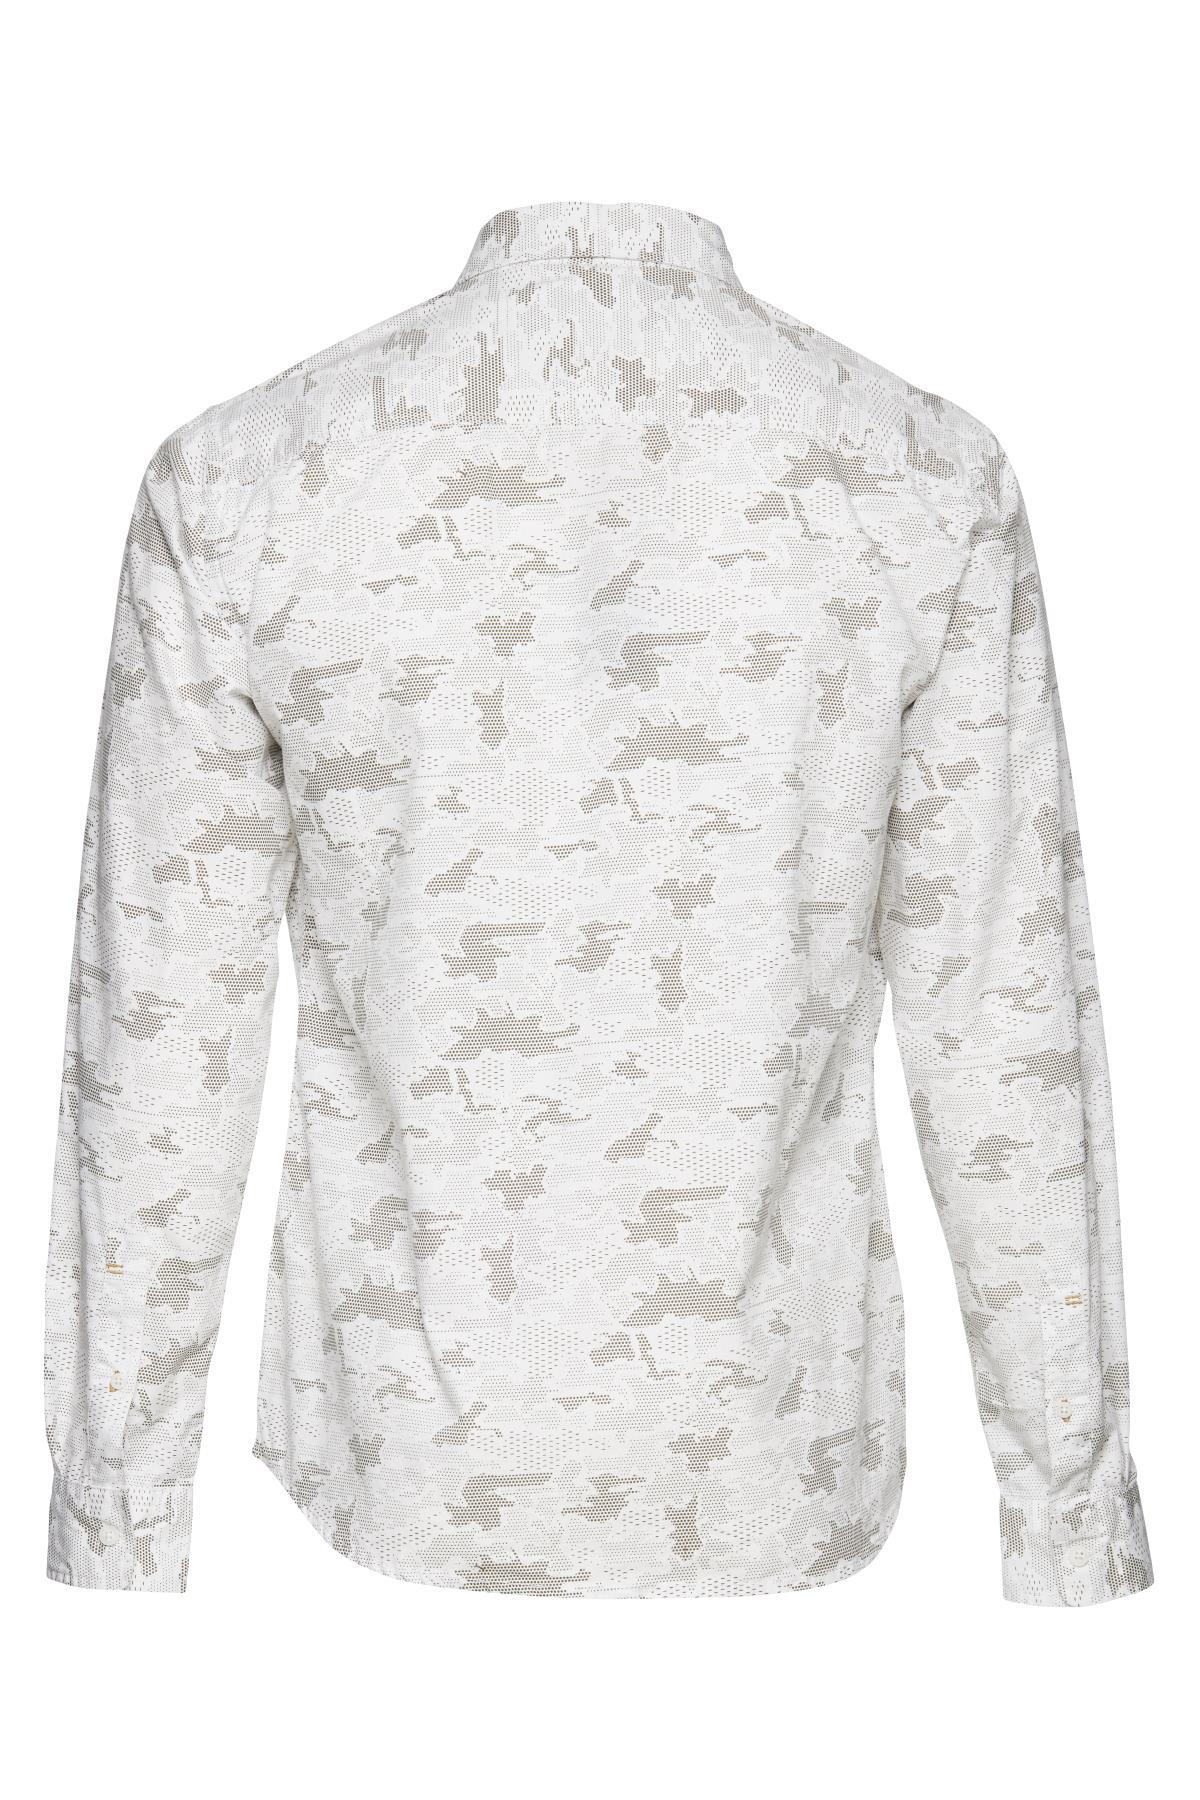 Off-white/khaki Langærmet skjorte – Køb Off-white/khaki Langærmet skjorte fra str. M-XXL her